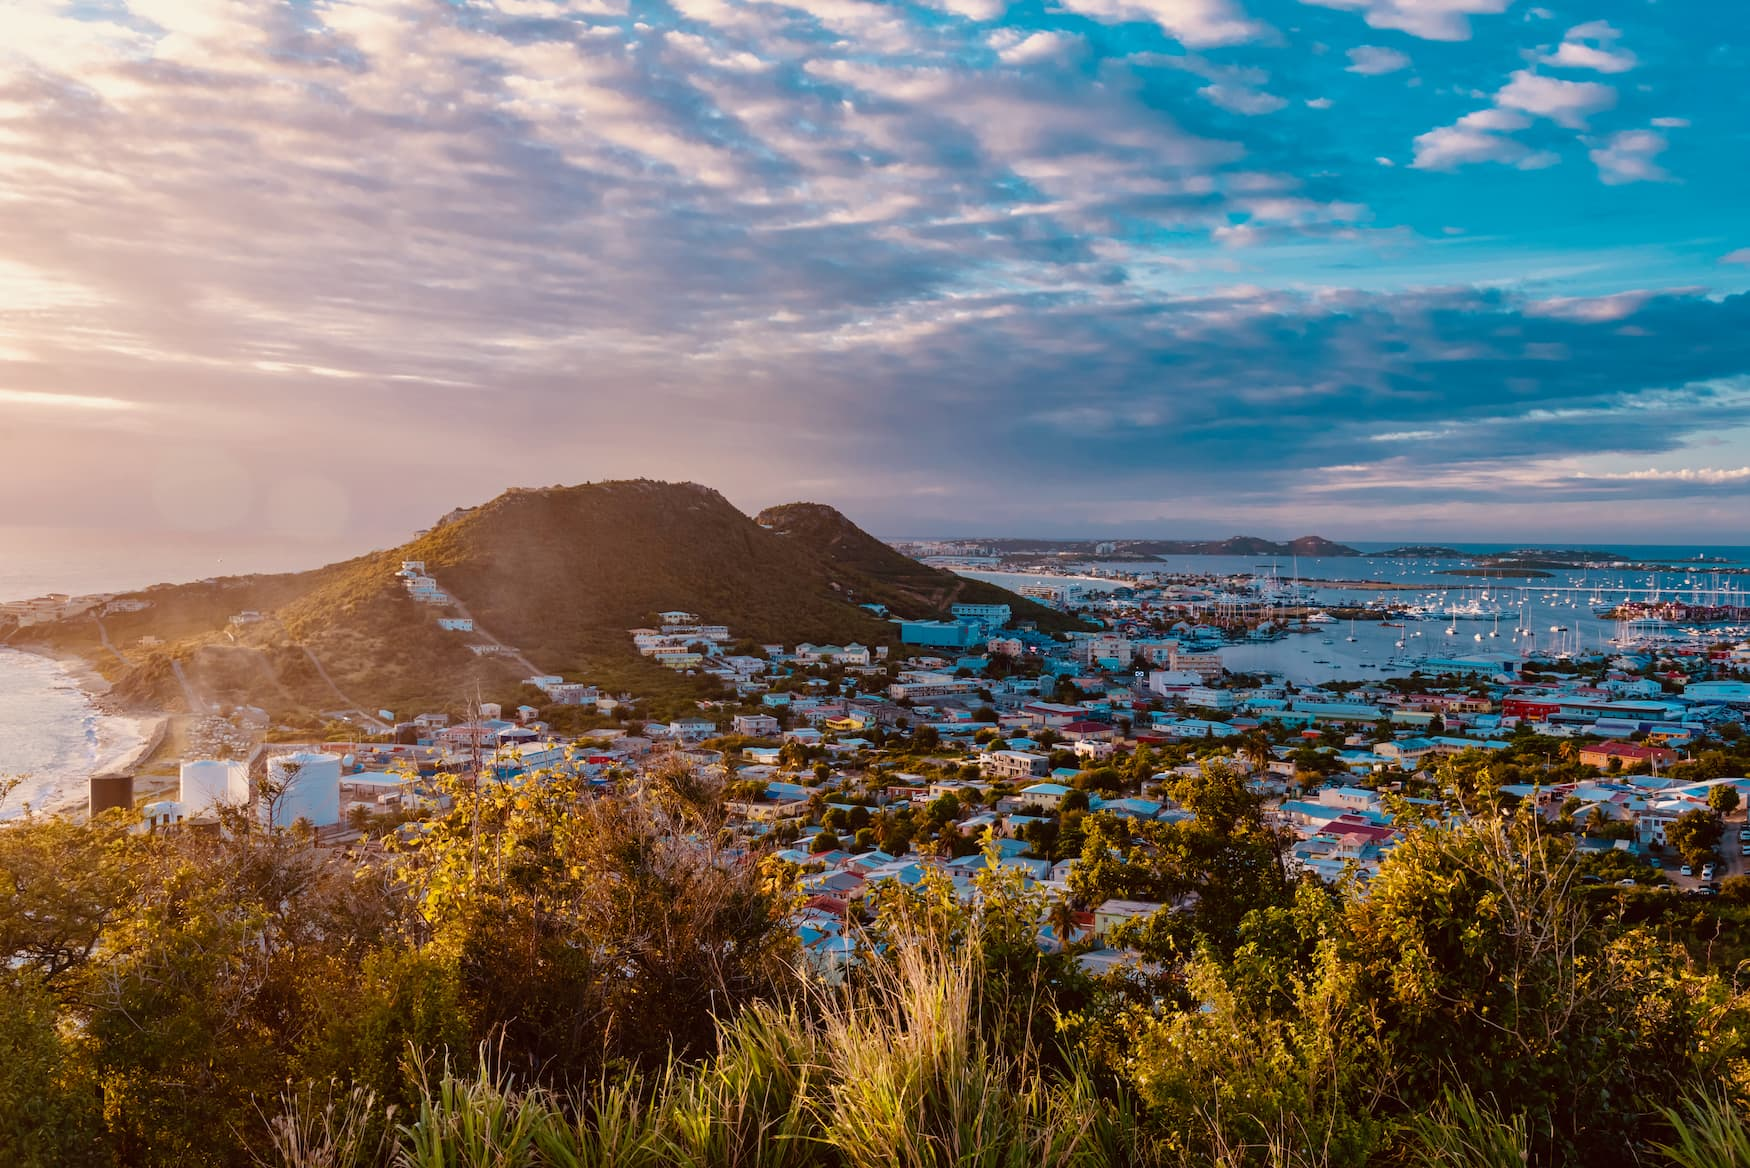 Sonnenuntergang über der Karibikinsel St. Maarten